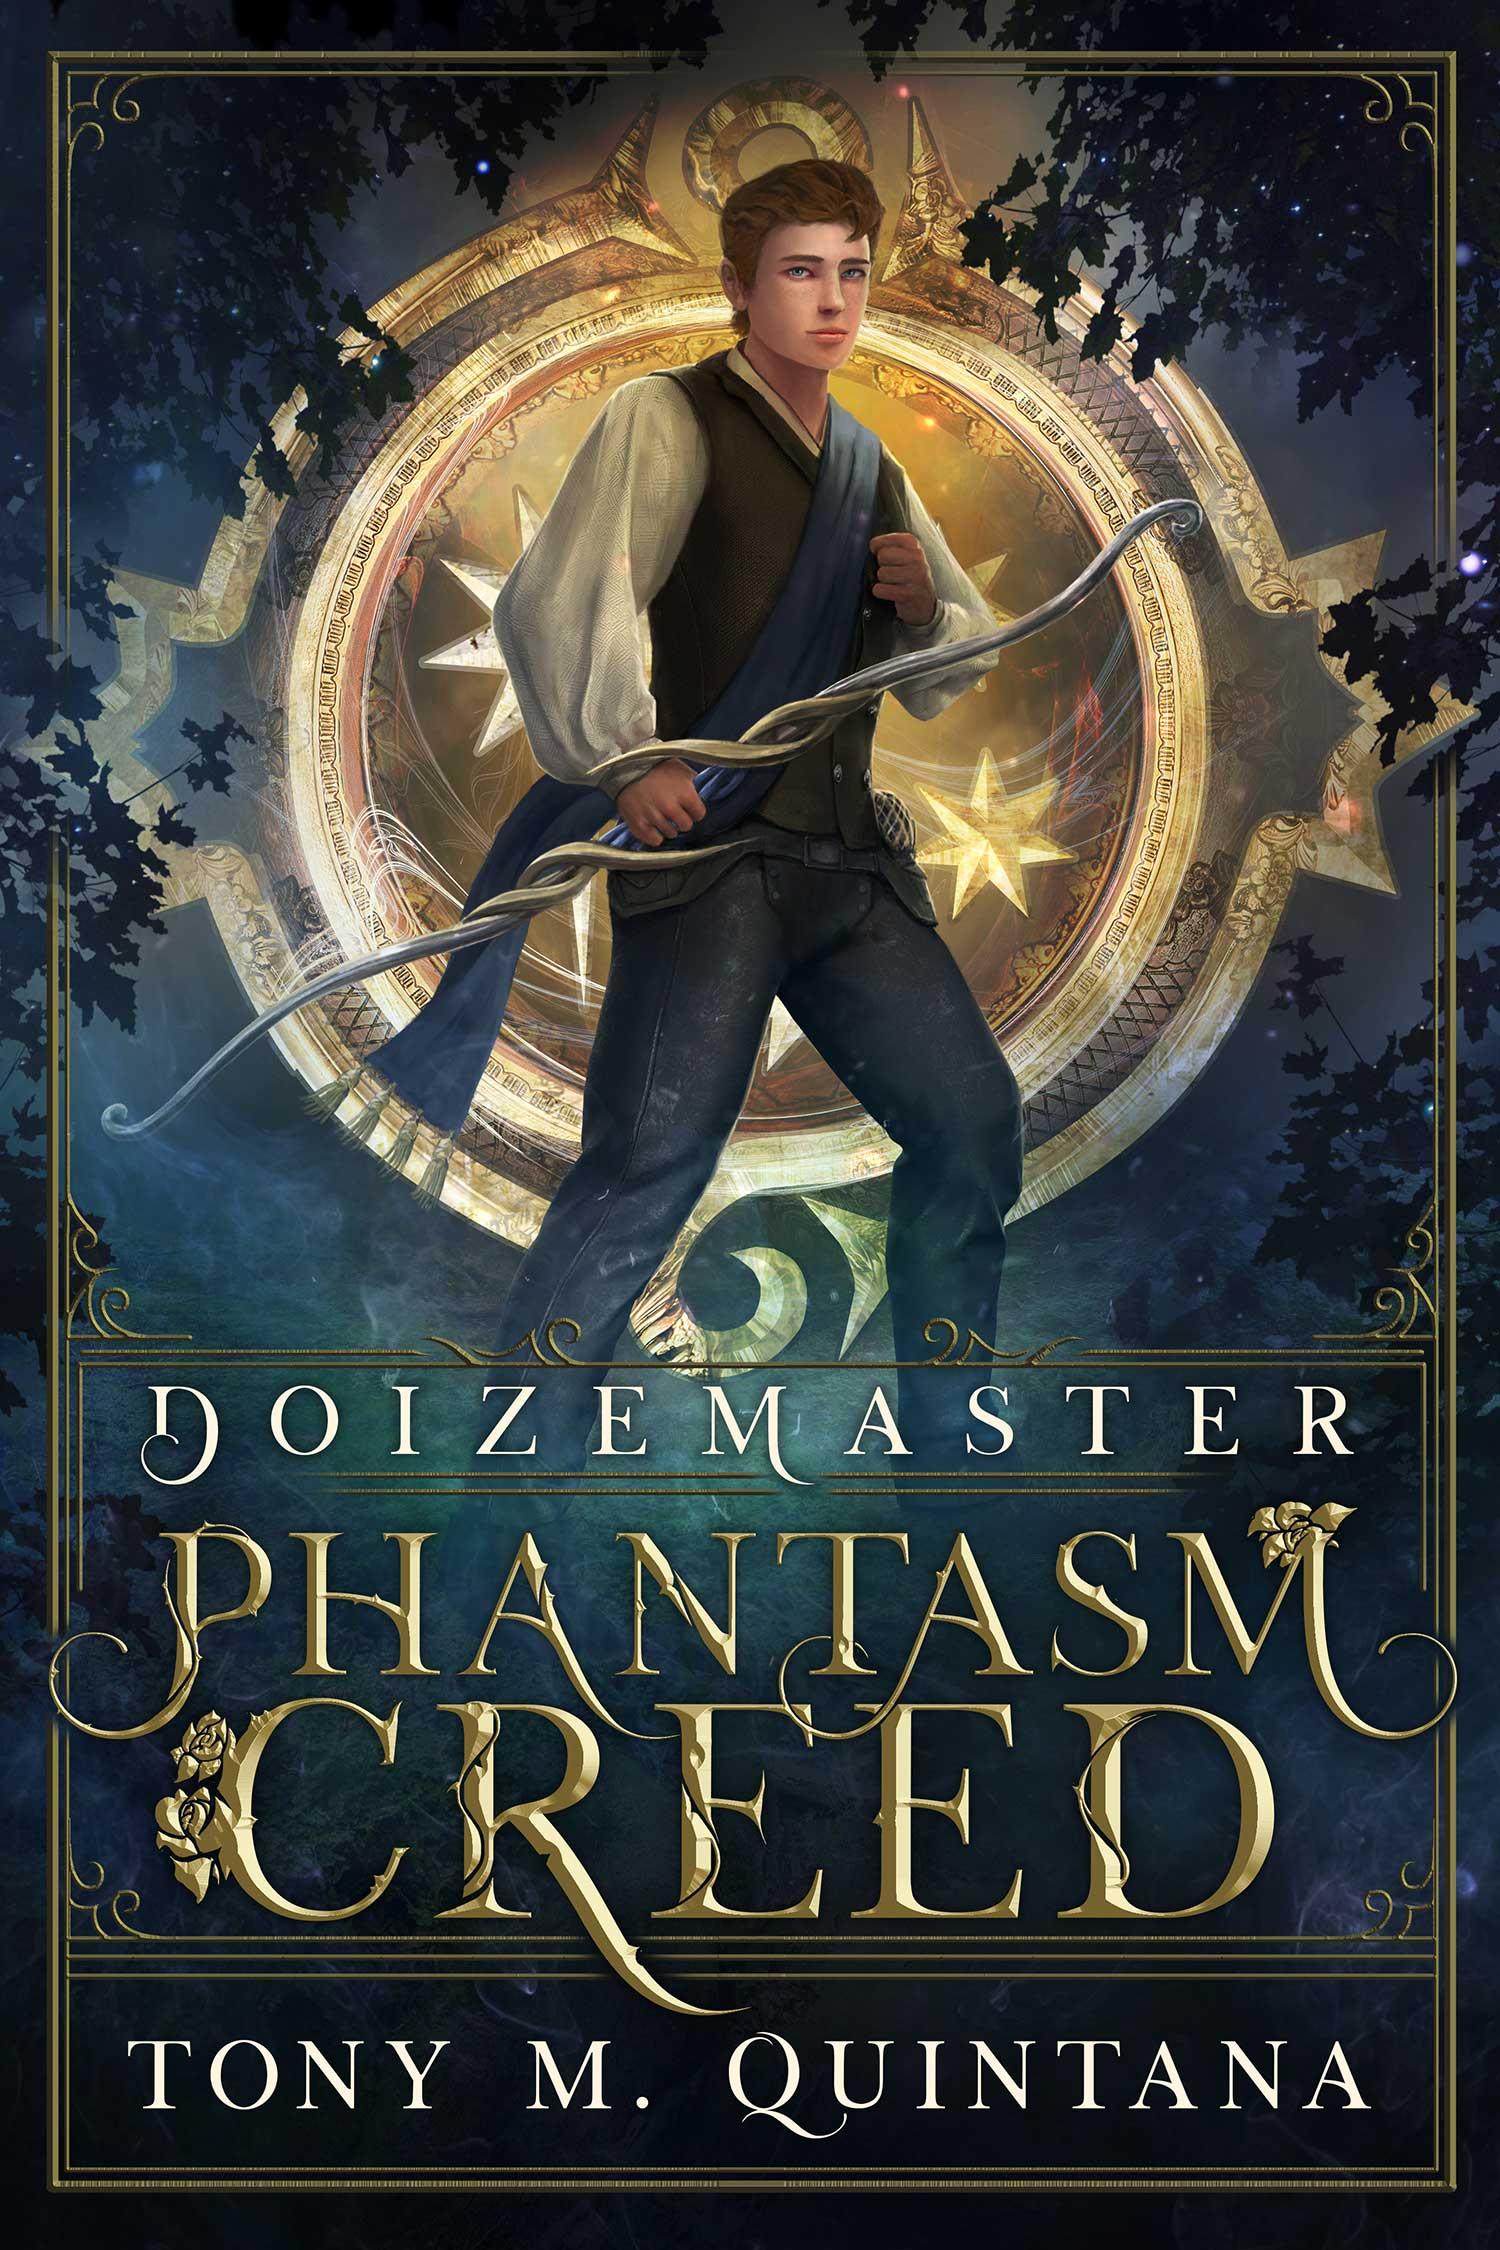 doizemastern phantasm creed book cover